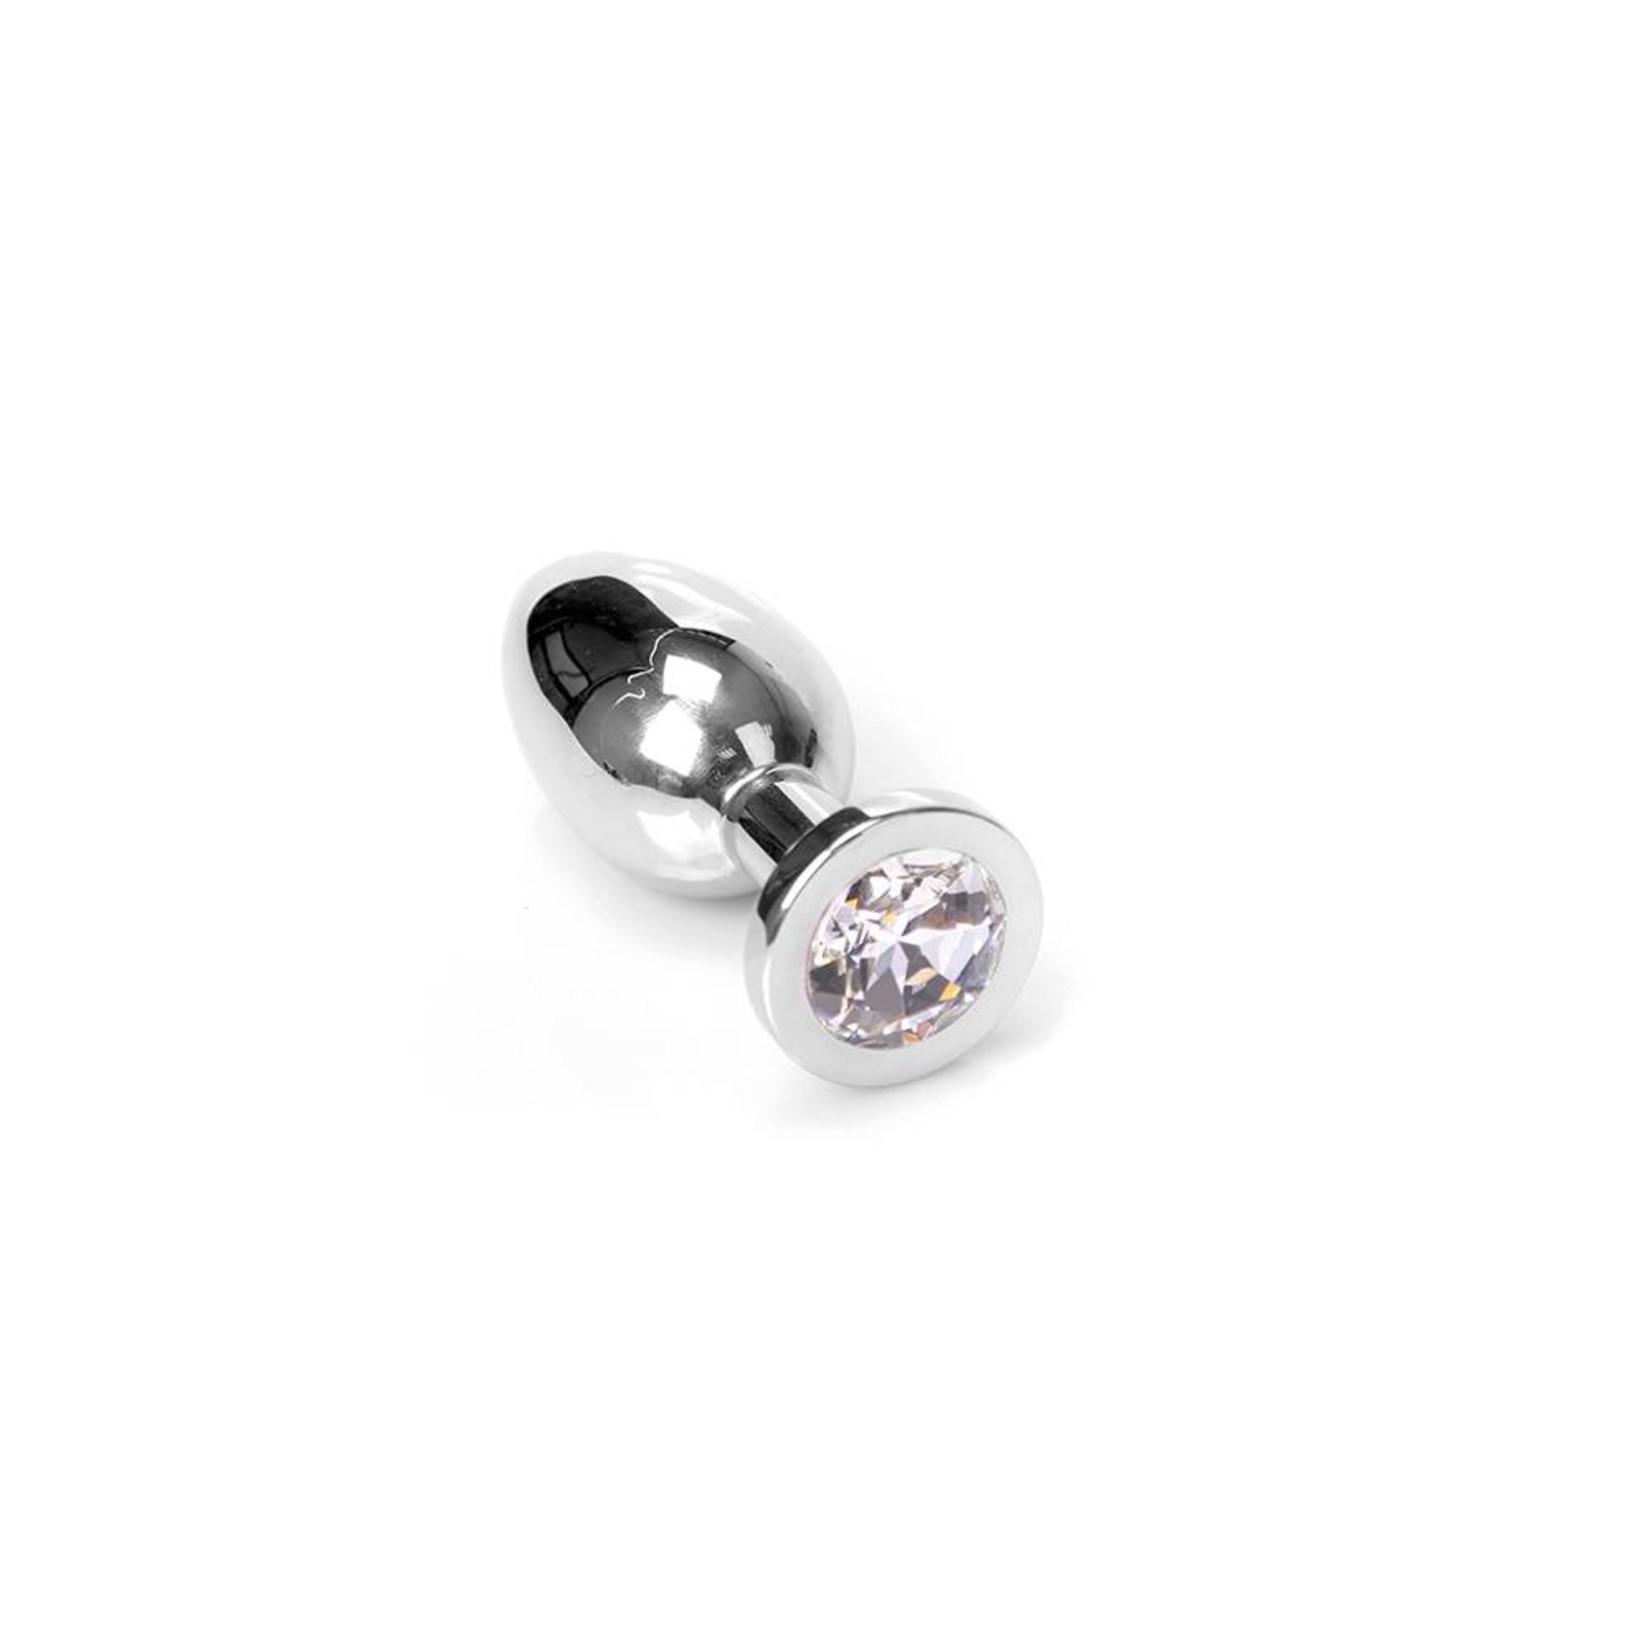 KIOTOS Steel Jewel Buttplug - Medium Clear